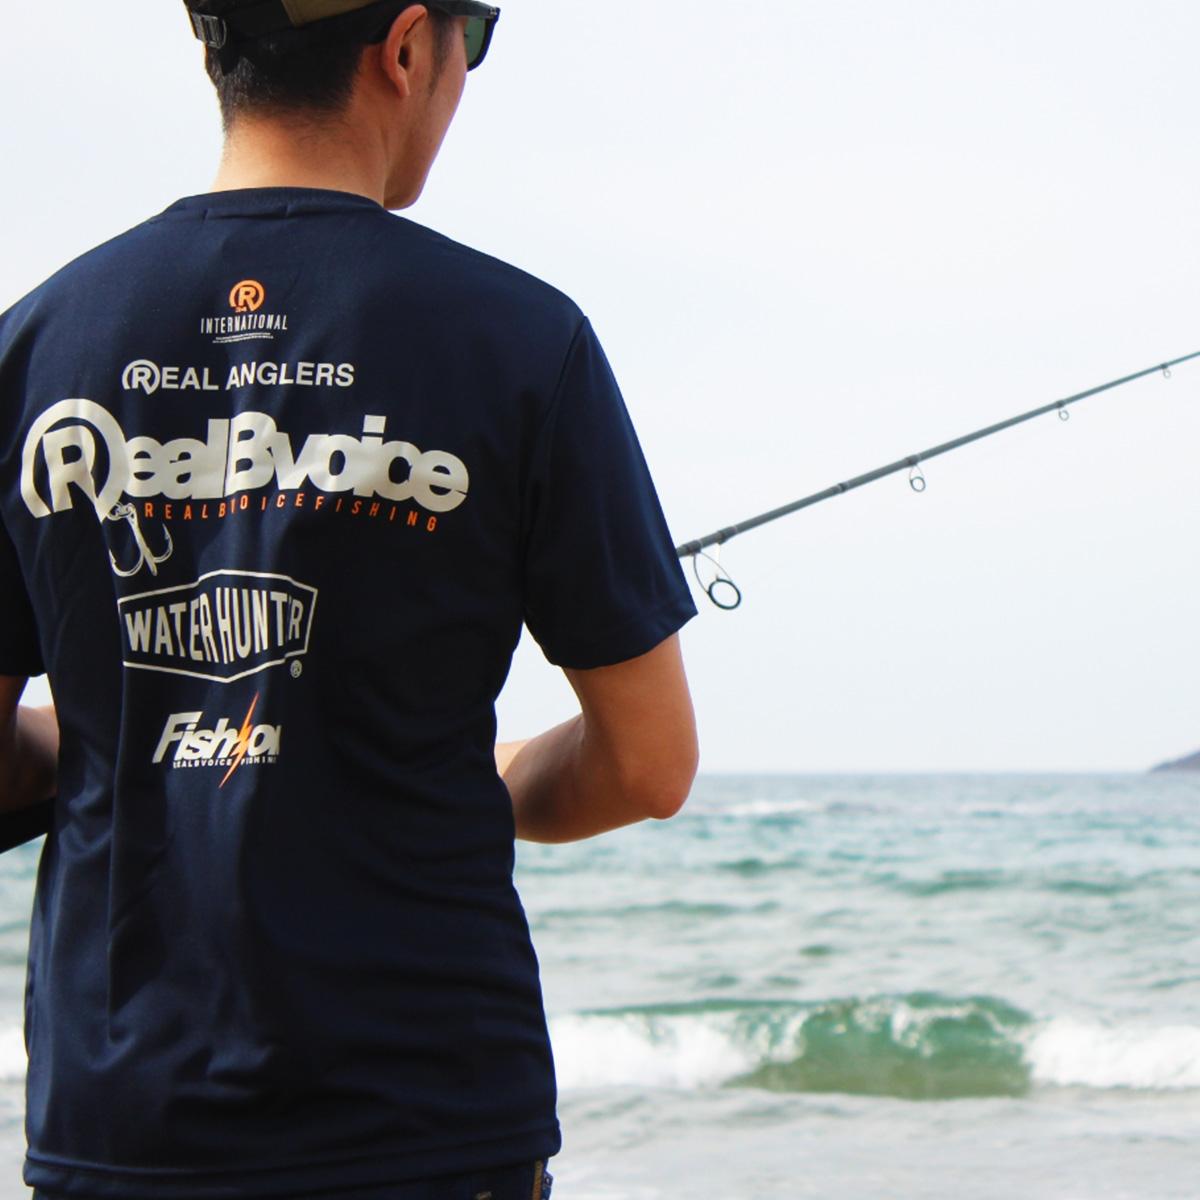 FISHING WATER HUNTER DRY T-SHIRT